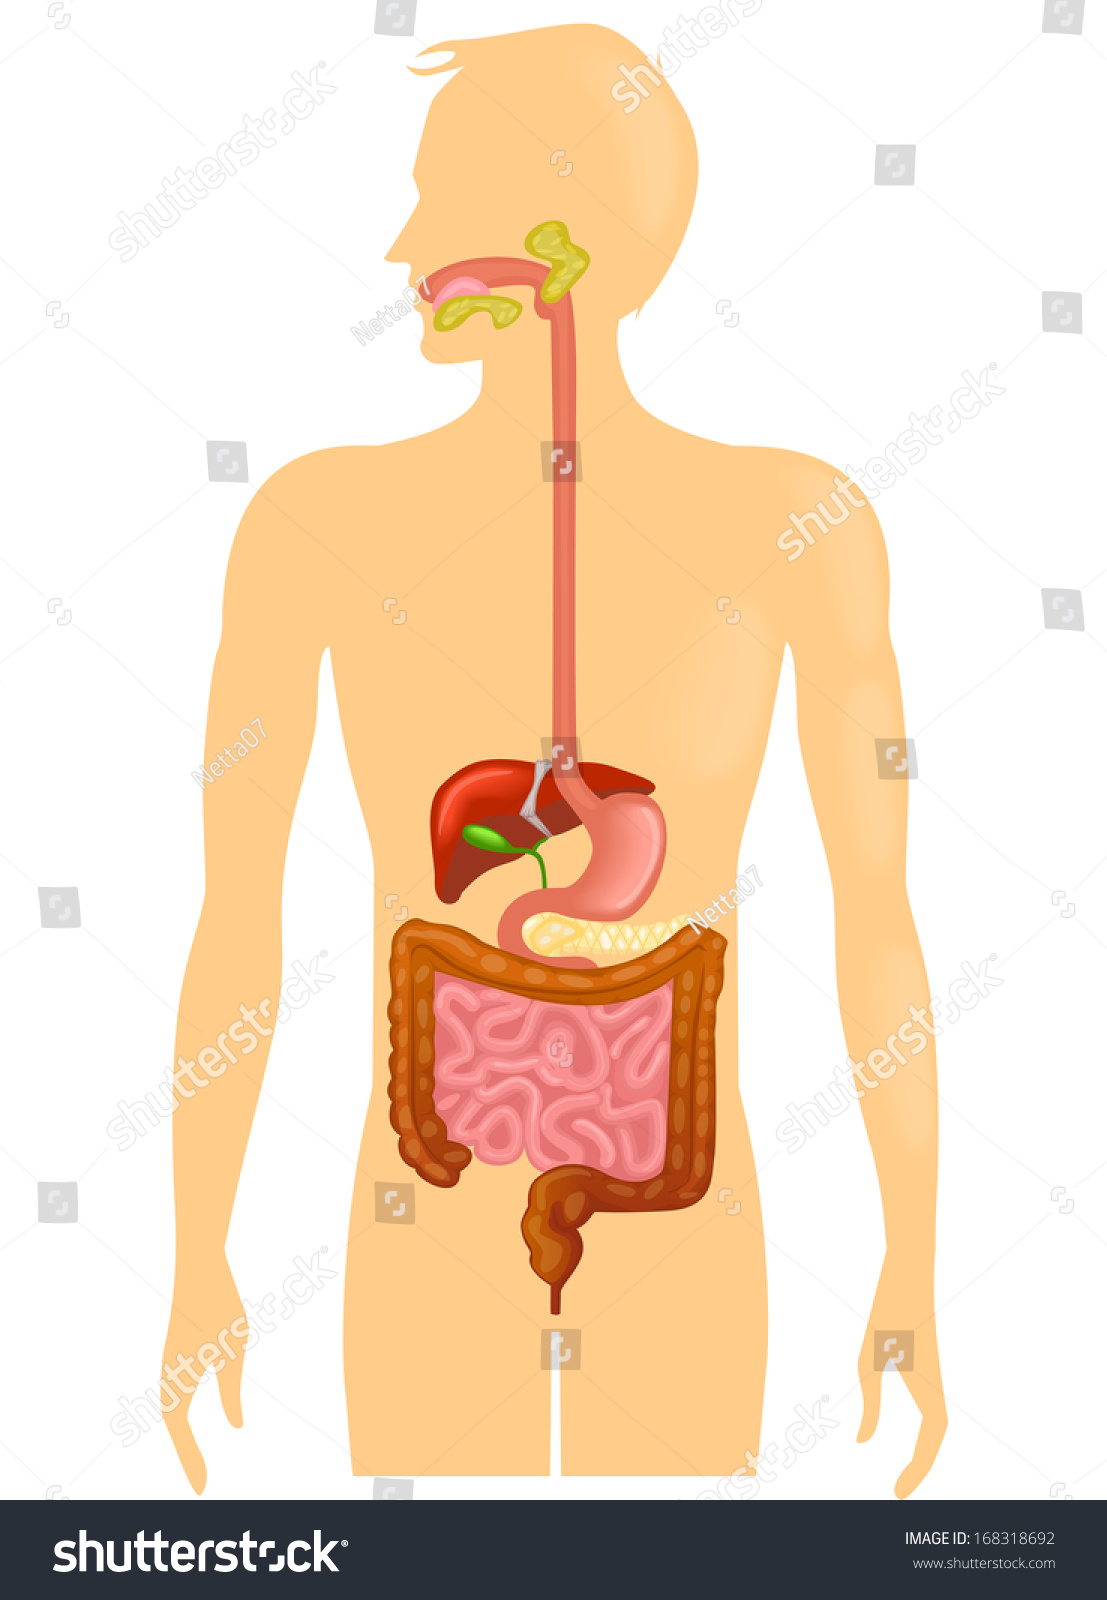 Human Digestive System Illustration Stock Vector Royalty Free